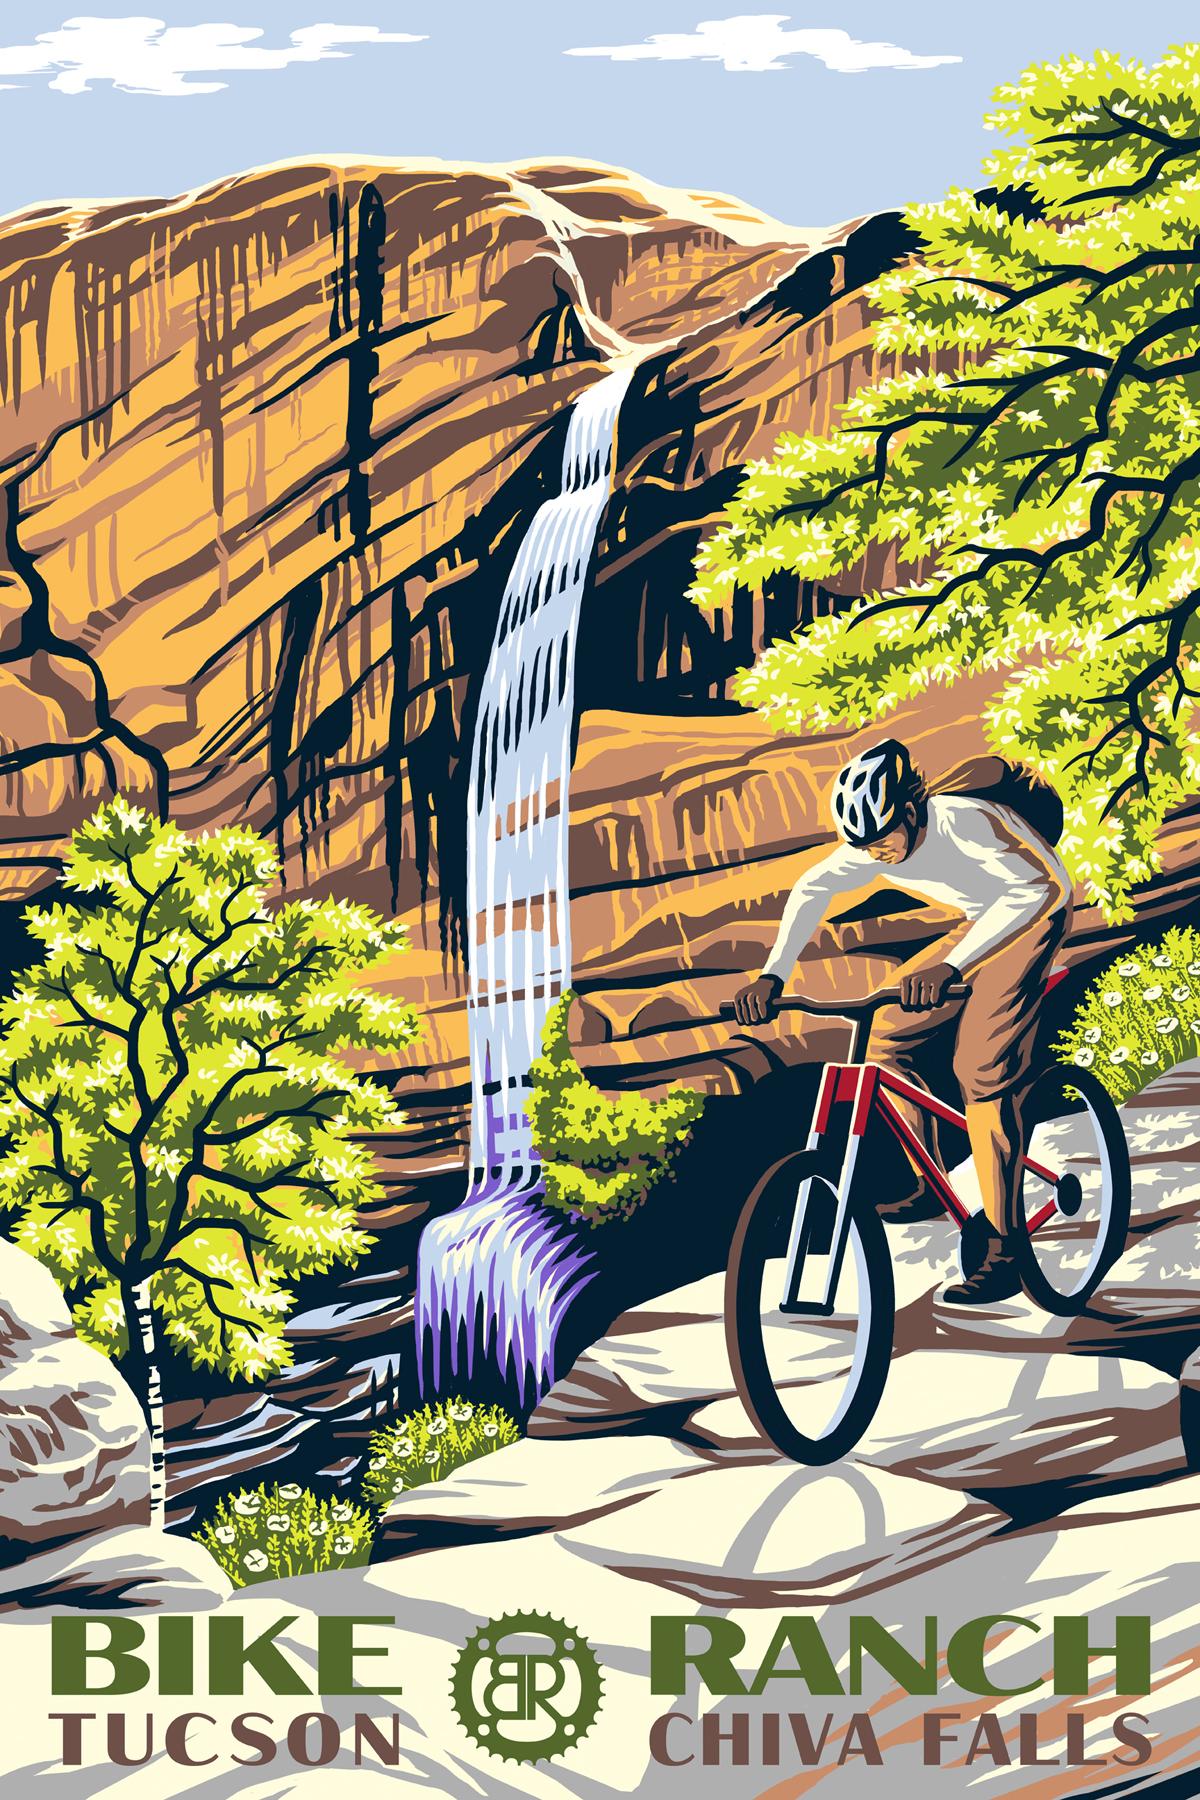 Chiva Falls cycling poster